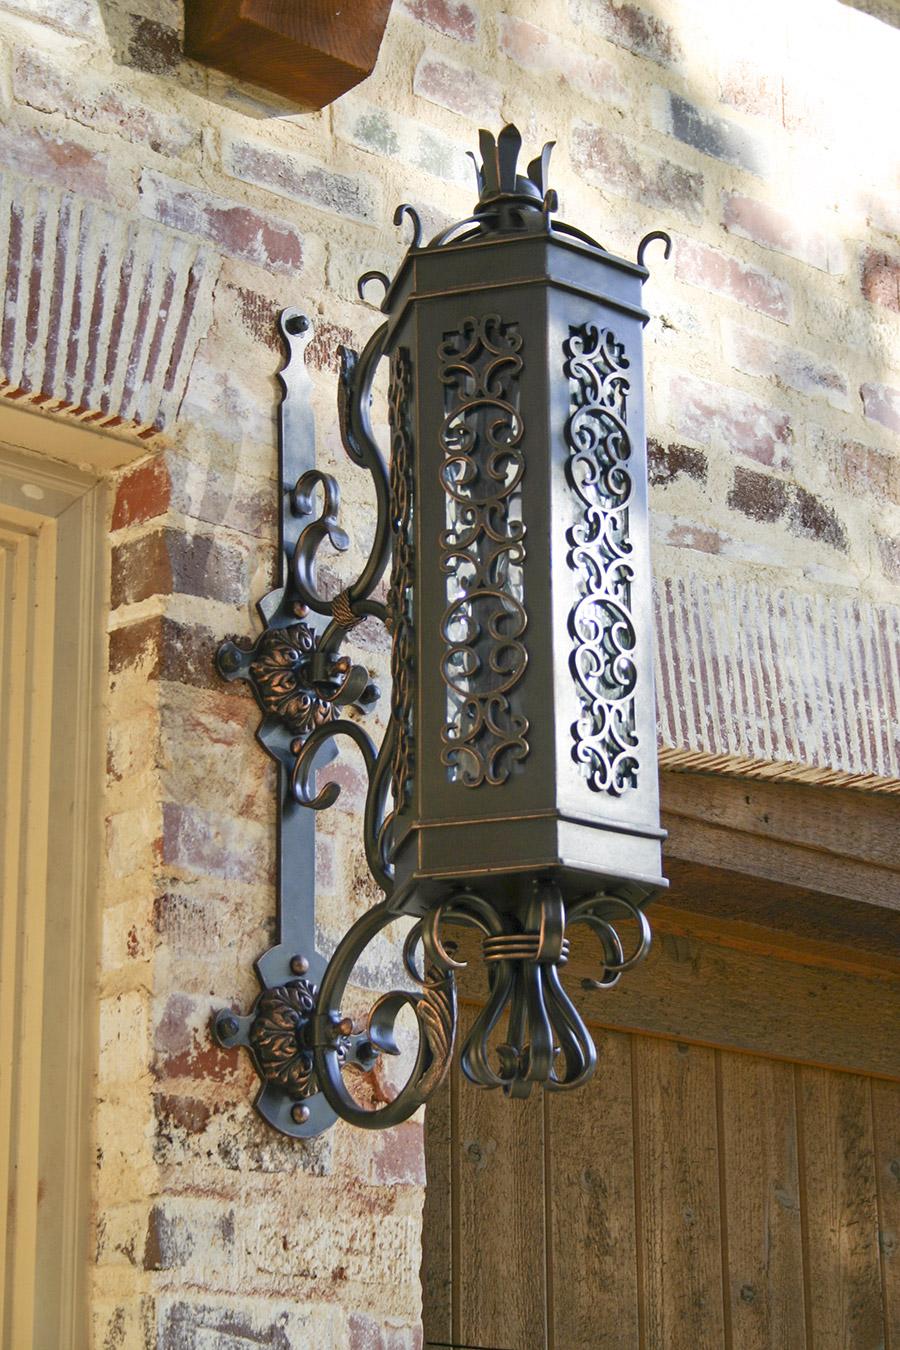 custom-Victory-iron-lighting-fixture-foyer-hall-pendant-entry-kitchen-solara-ligthing-E007-012-EL-(13)